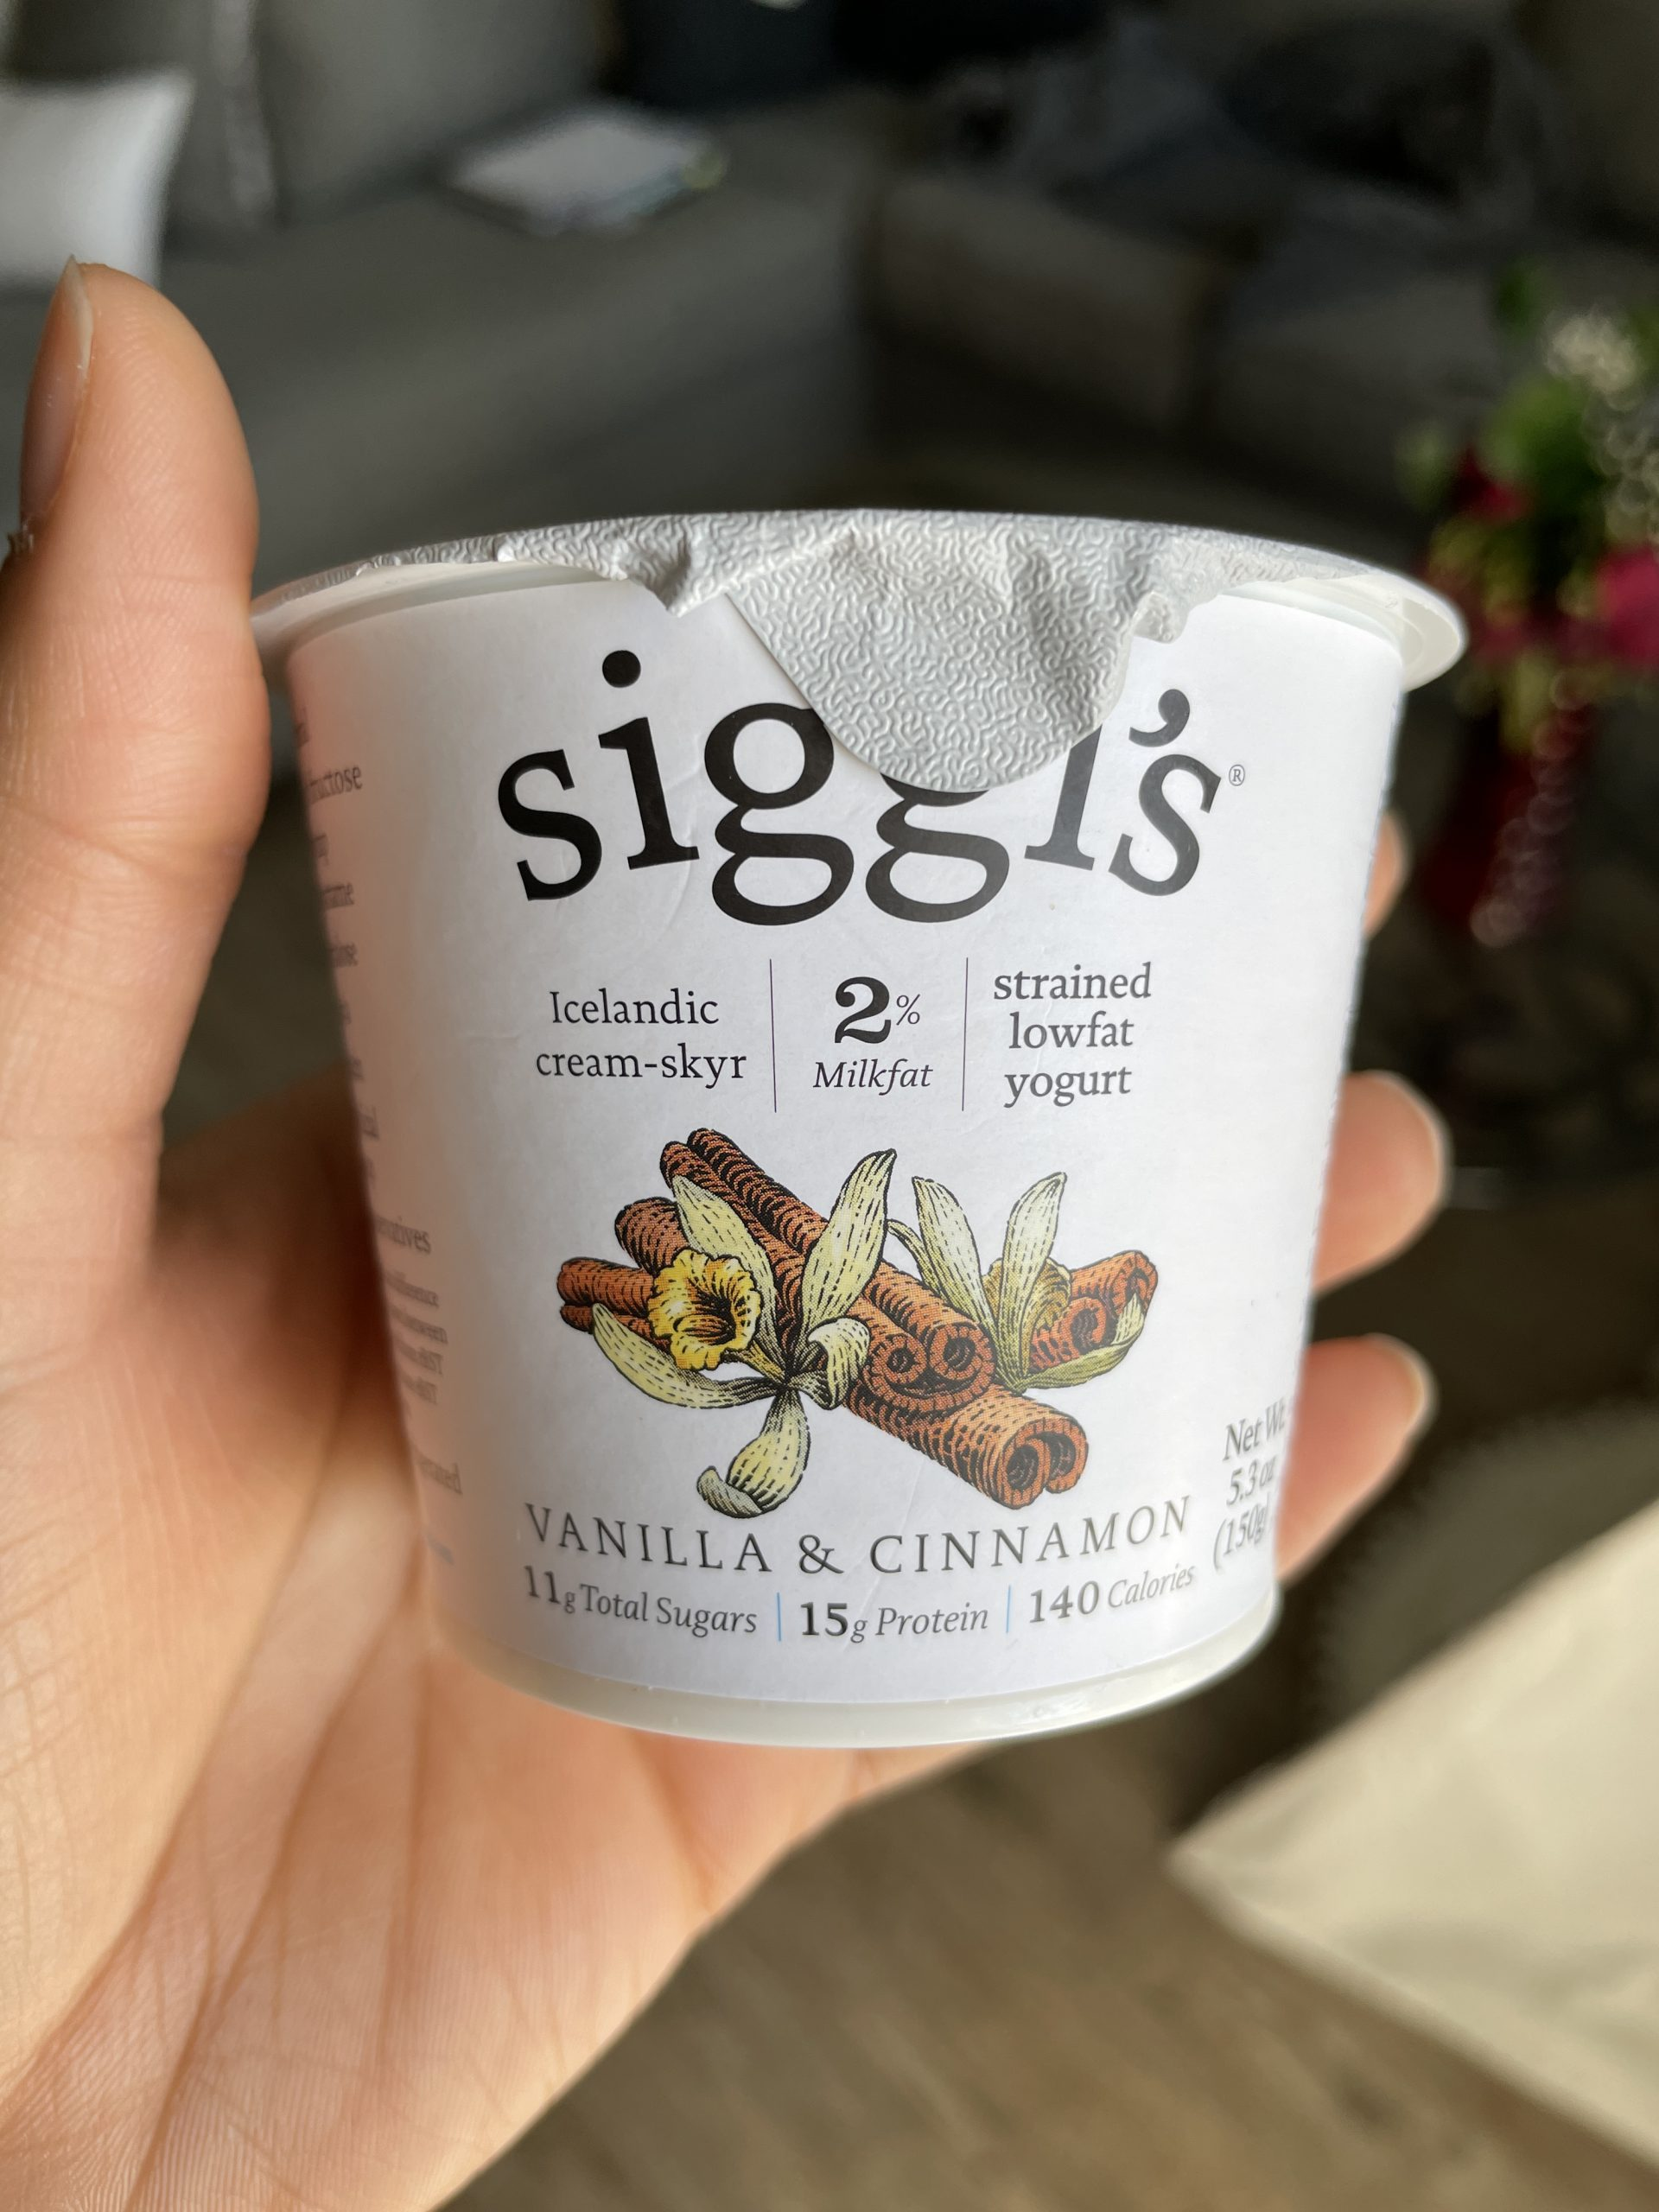 siggi's vanilla & cinnamon yogurt | High Protein Sweet Treat for Snack or Dessert